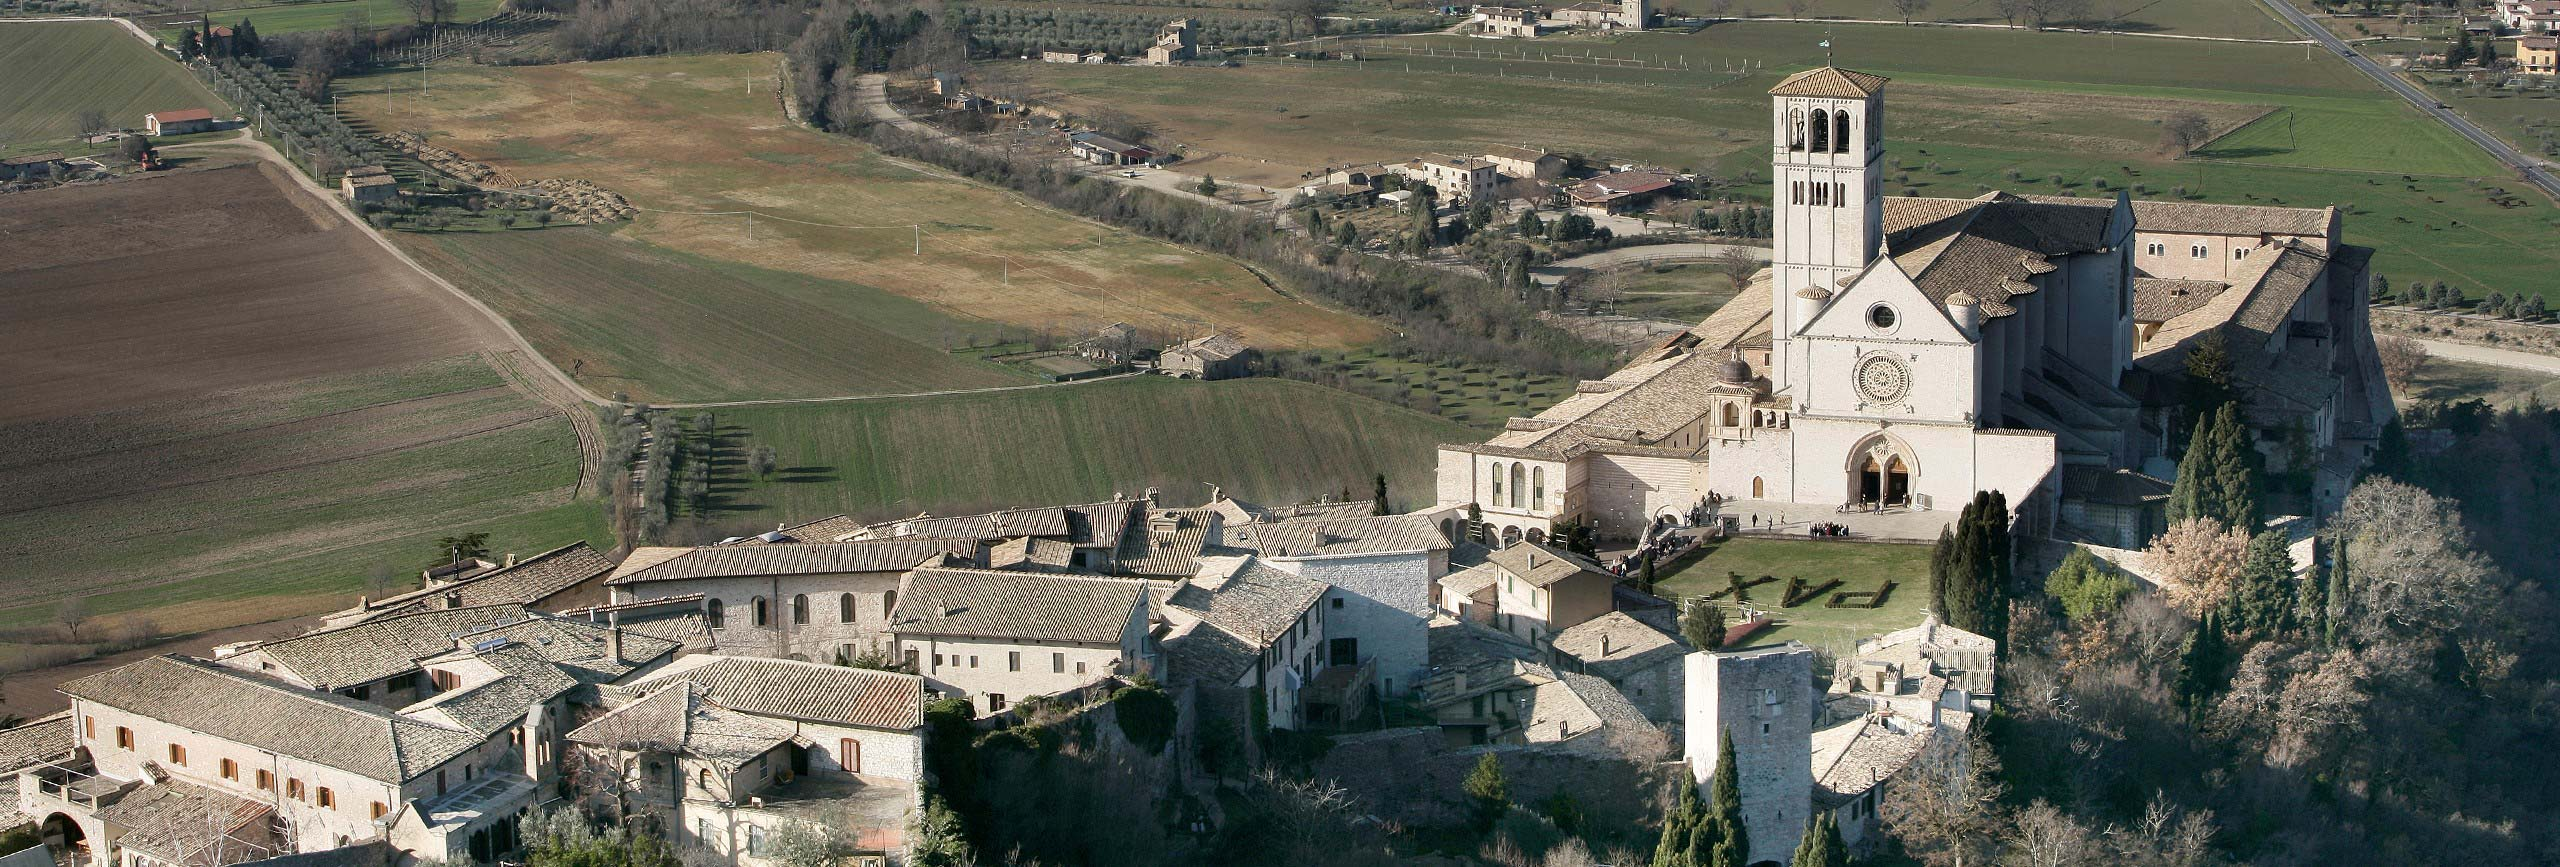 Slide3-Panorama-Assisi-Ottimizzata